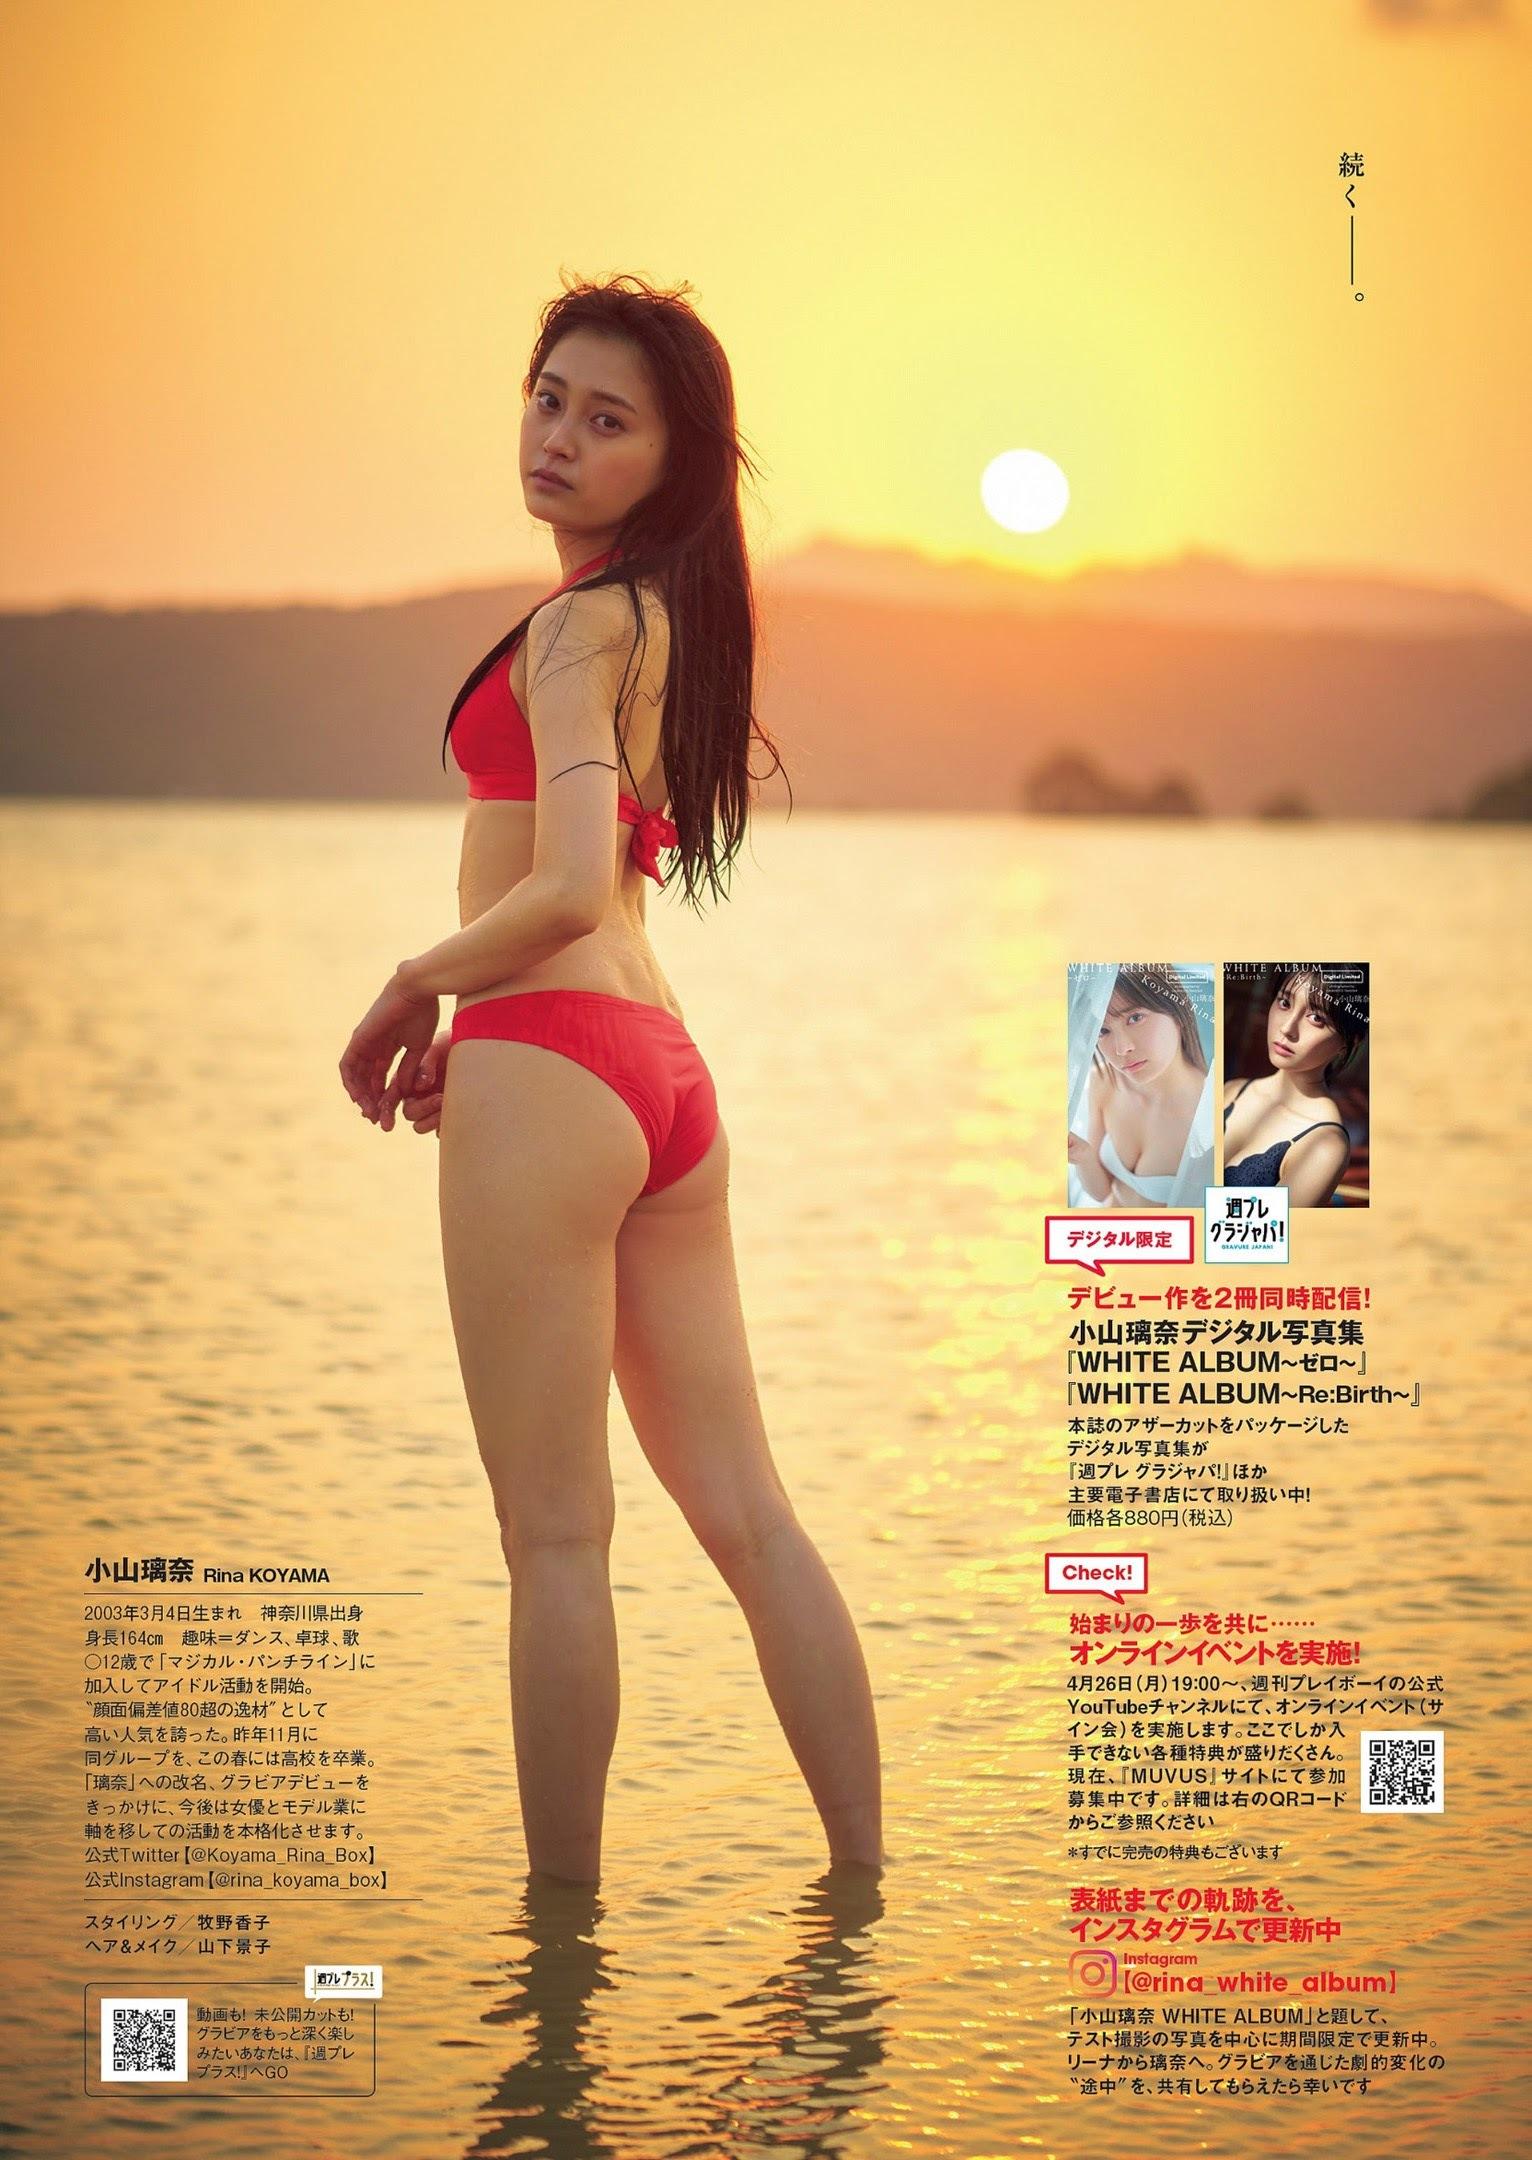 小山璃奈 頓知気さきな 伊藤美来-Weekly Playboy 2021年第十八期 高清套图 第15张